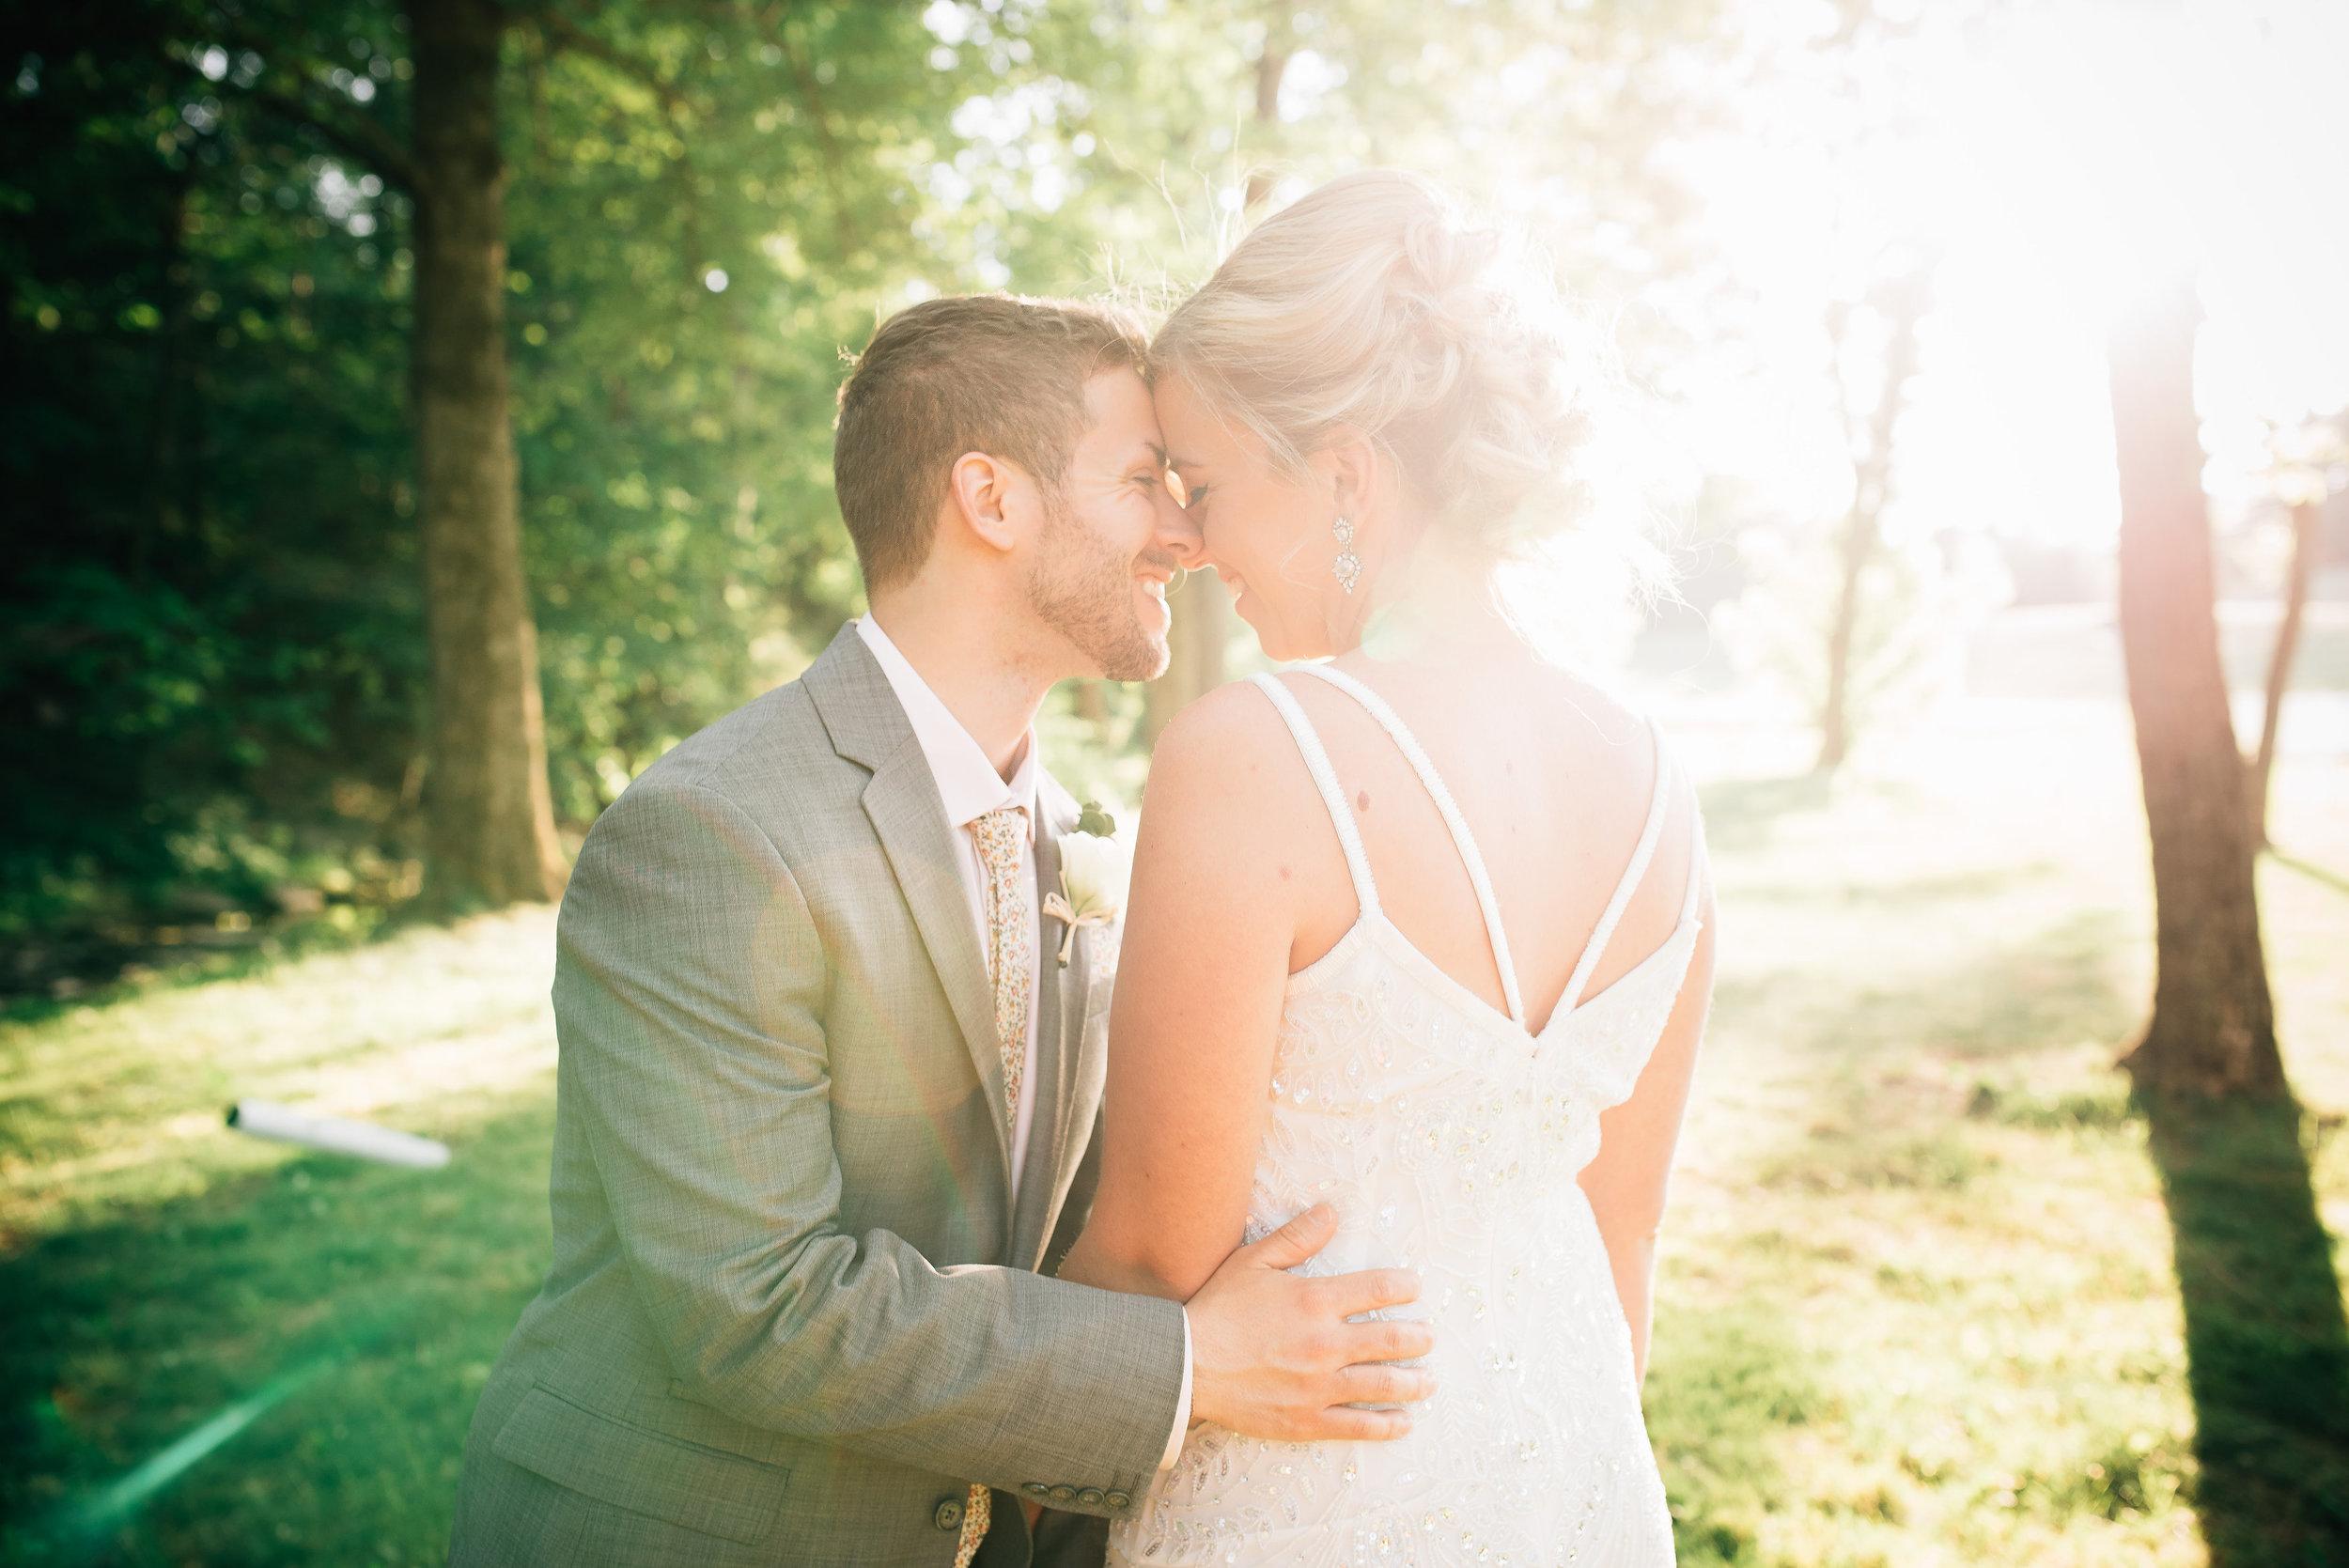 Wedding-LoriPaul-LaurenFletcher-25.jpg